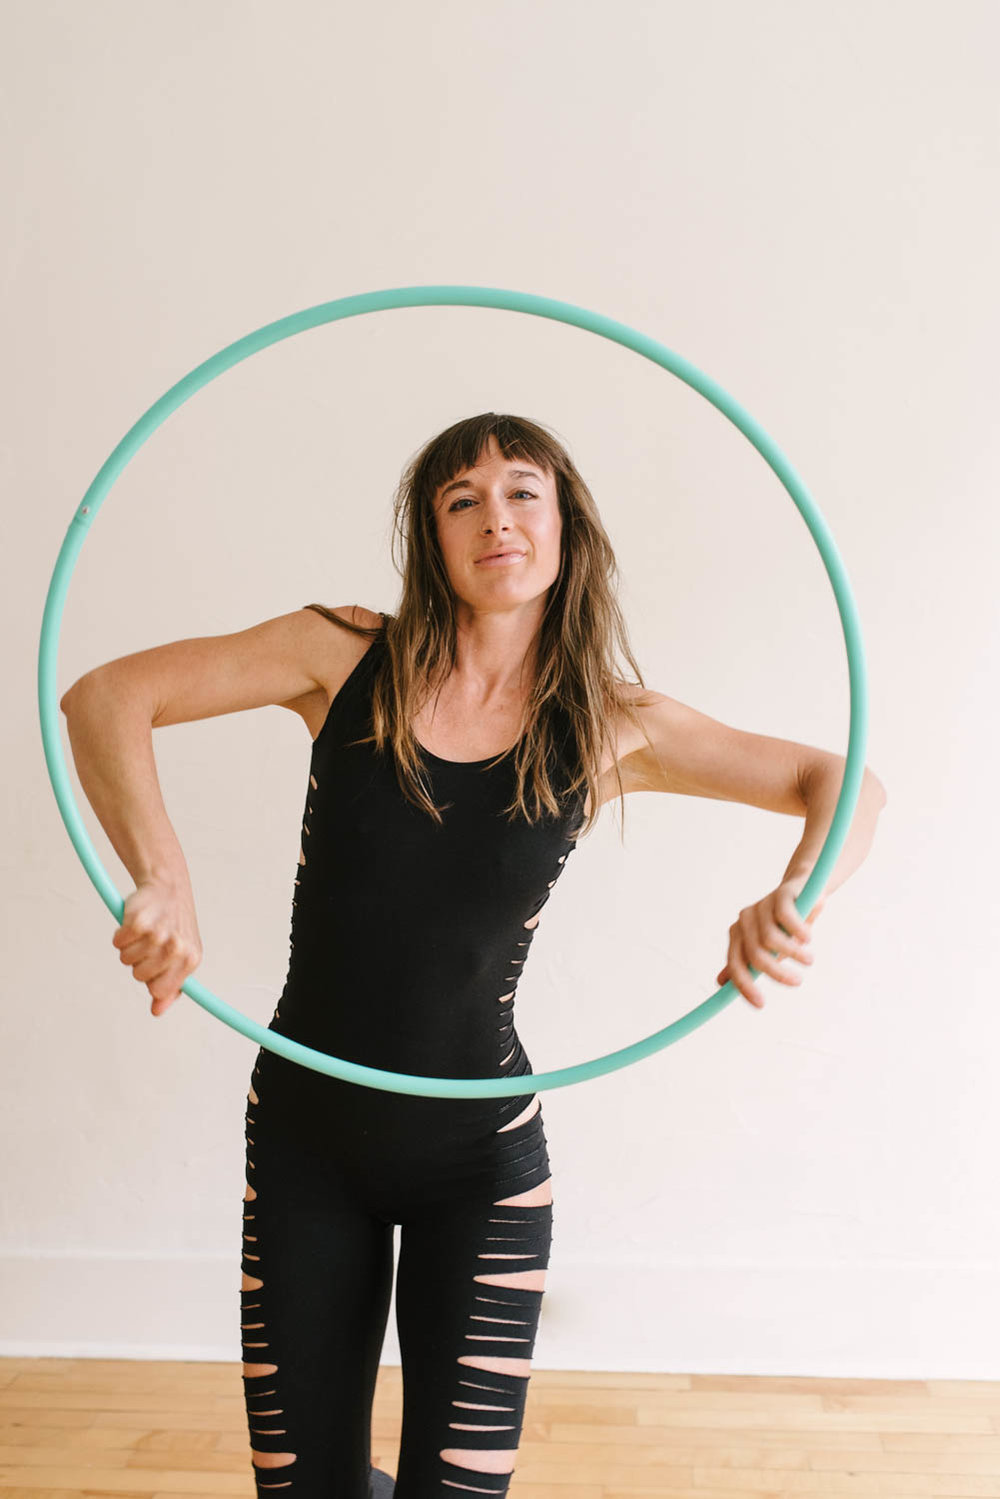 woman-with-hula-hoop-color-4-©Copyright-Elisabeth-Waller.jpg